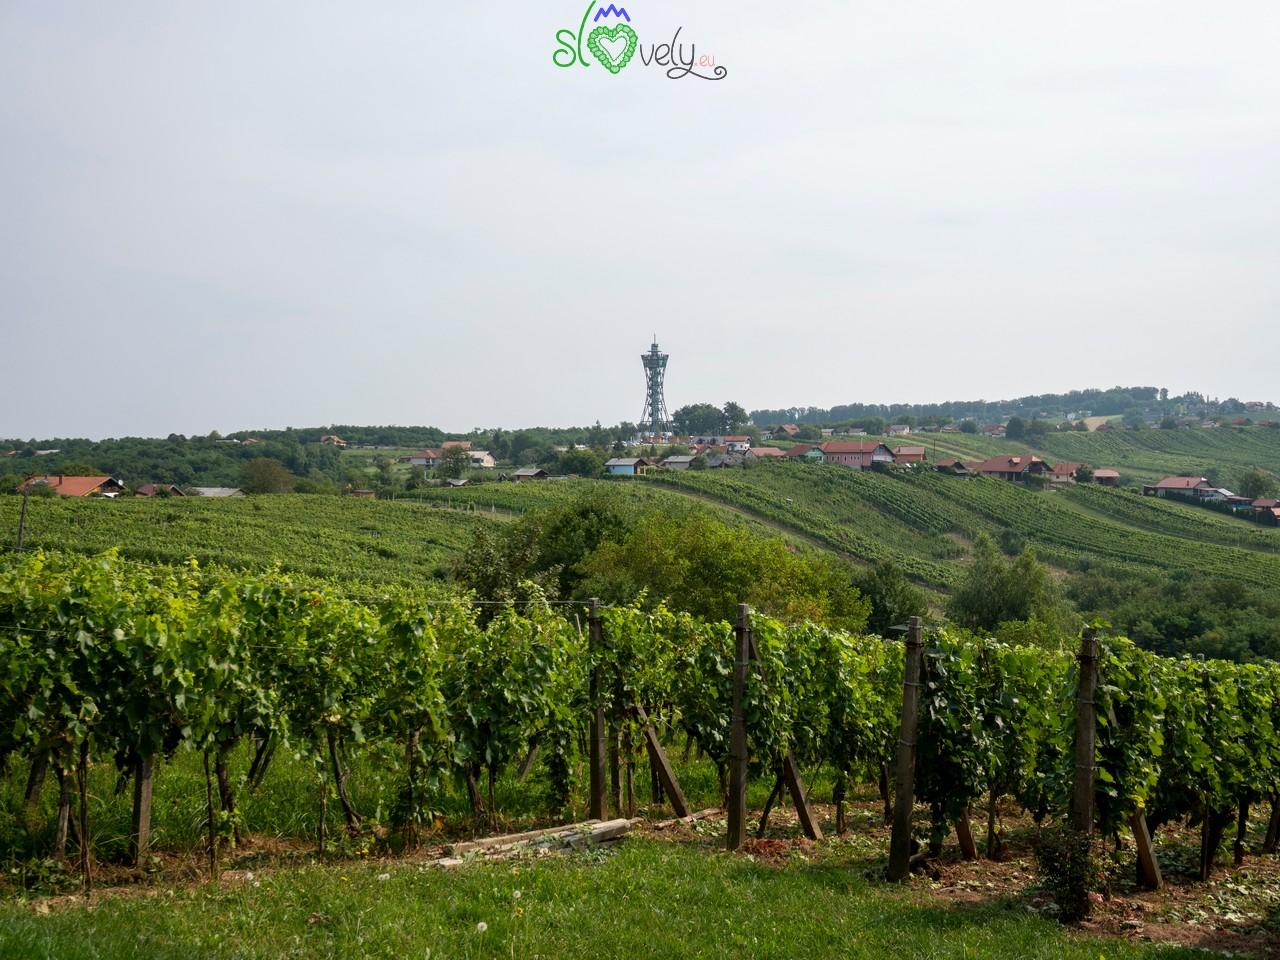 Lo splendido panorama dei vigneti delle Lendavske Gorice, dominate dal Vinarium.